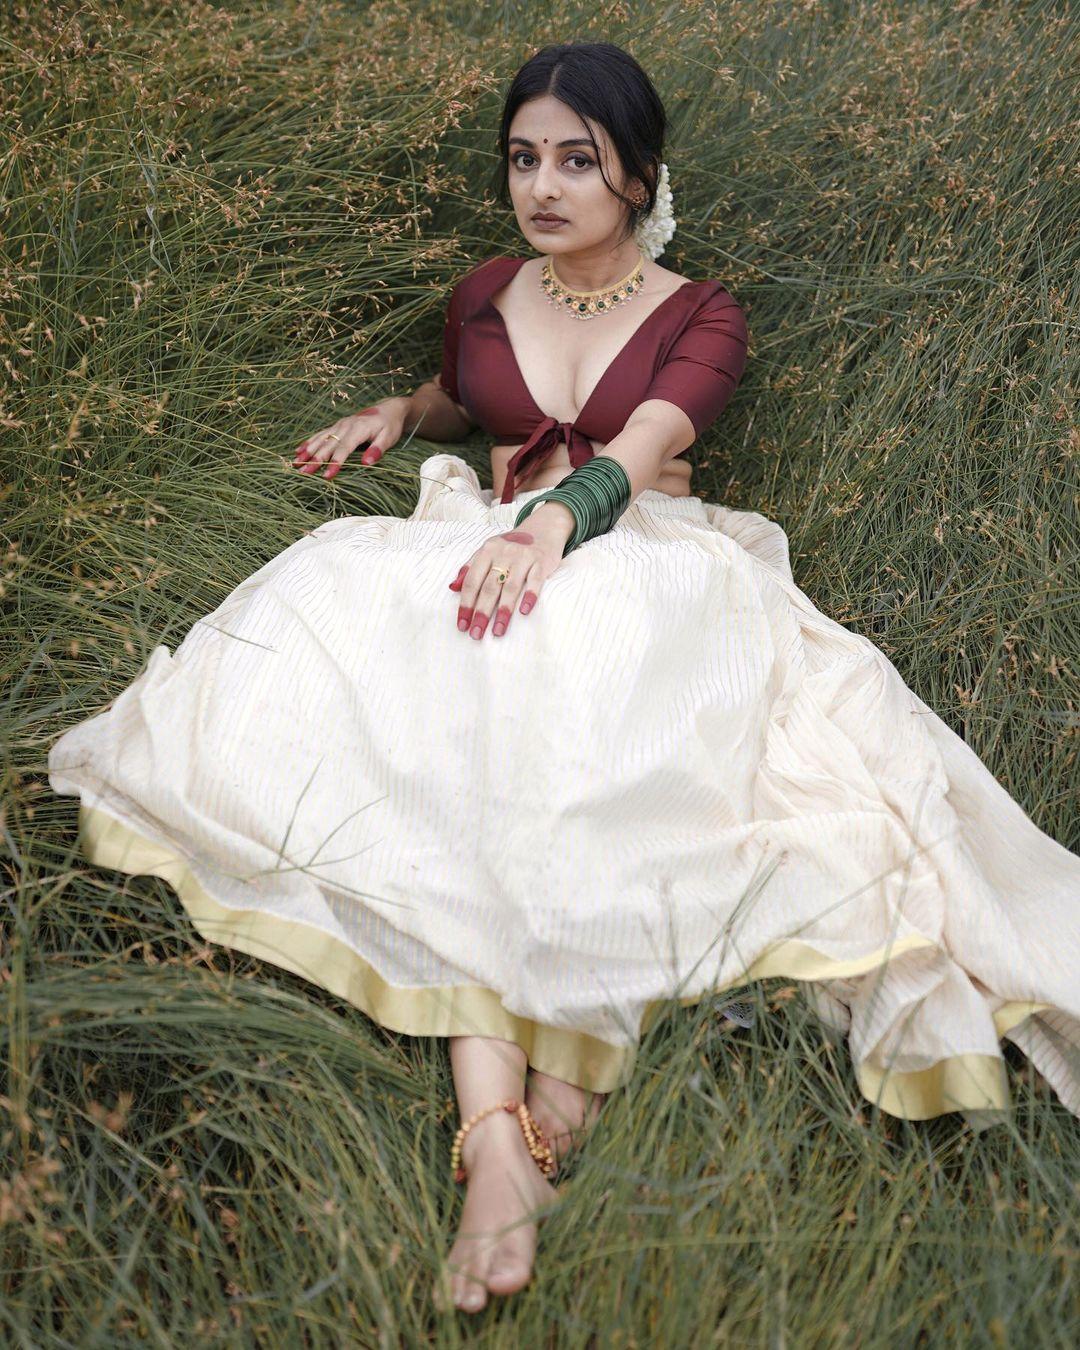 Esther-Anil-Sexy-Photoshoot-2